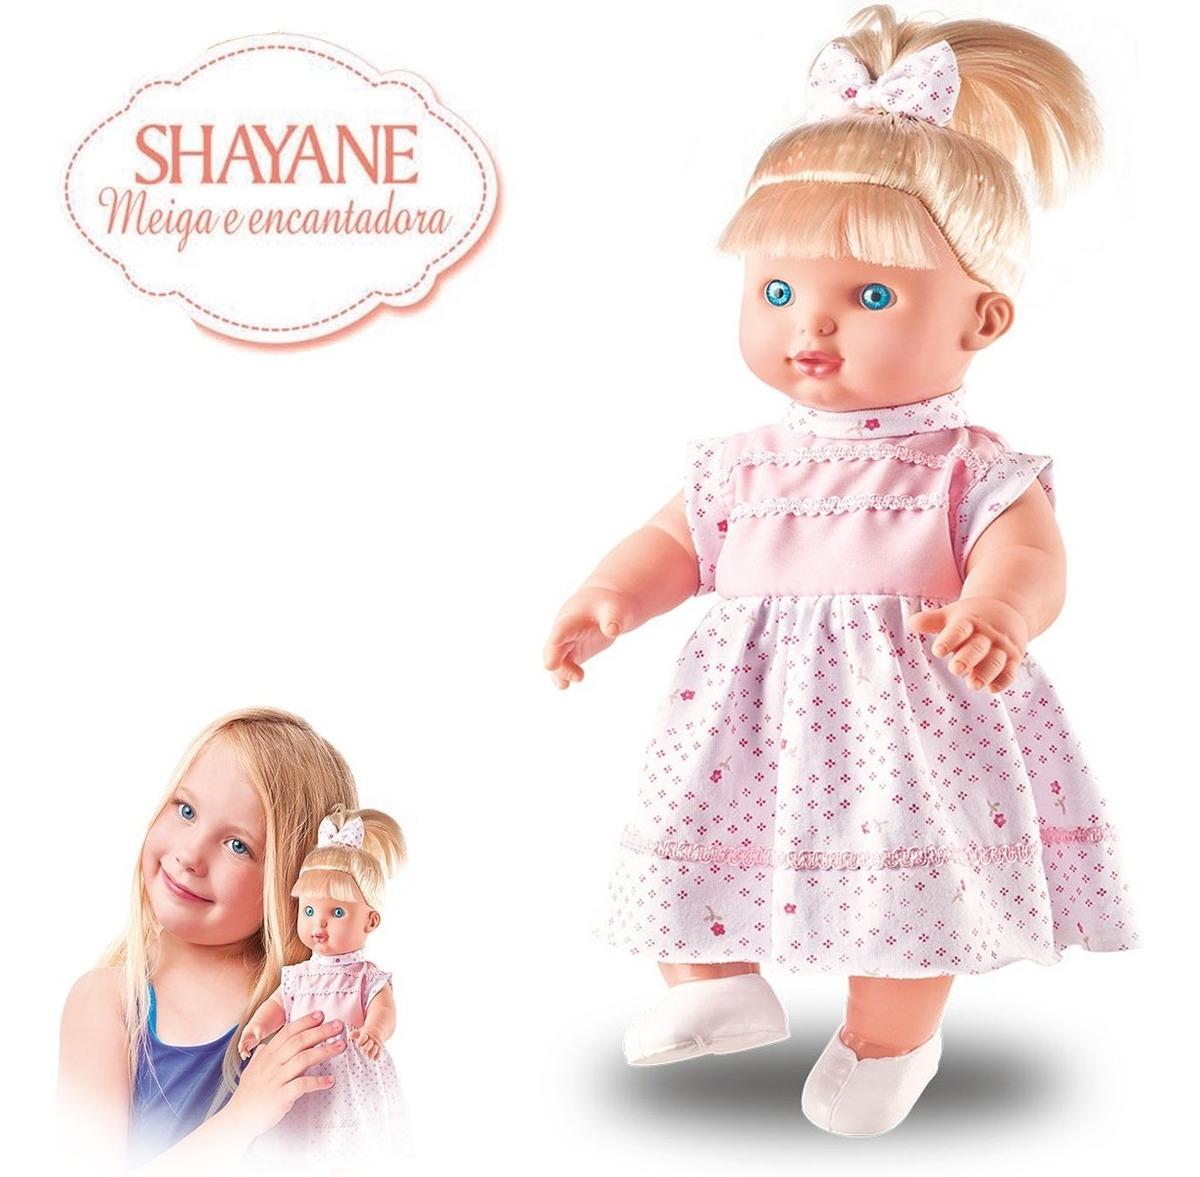 Boneca Meiga Shayane Fala 62 Frases Brinquedos Menina